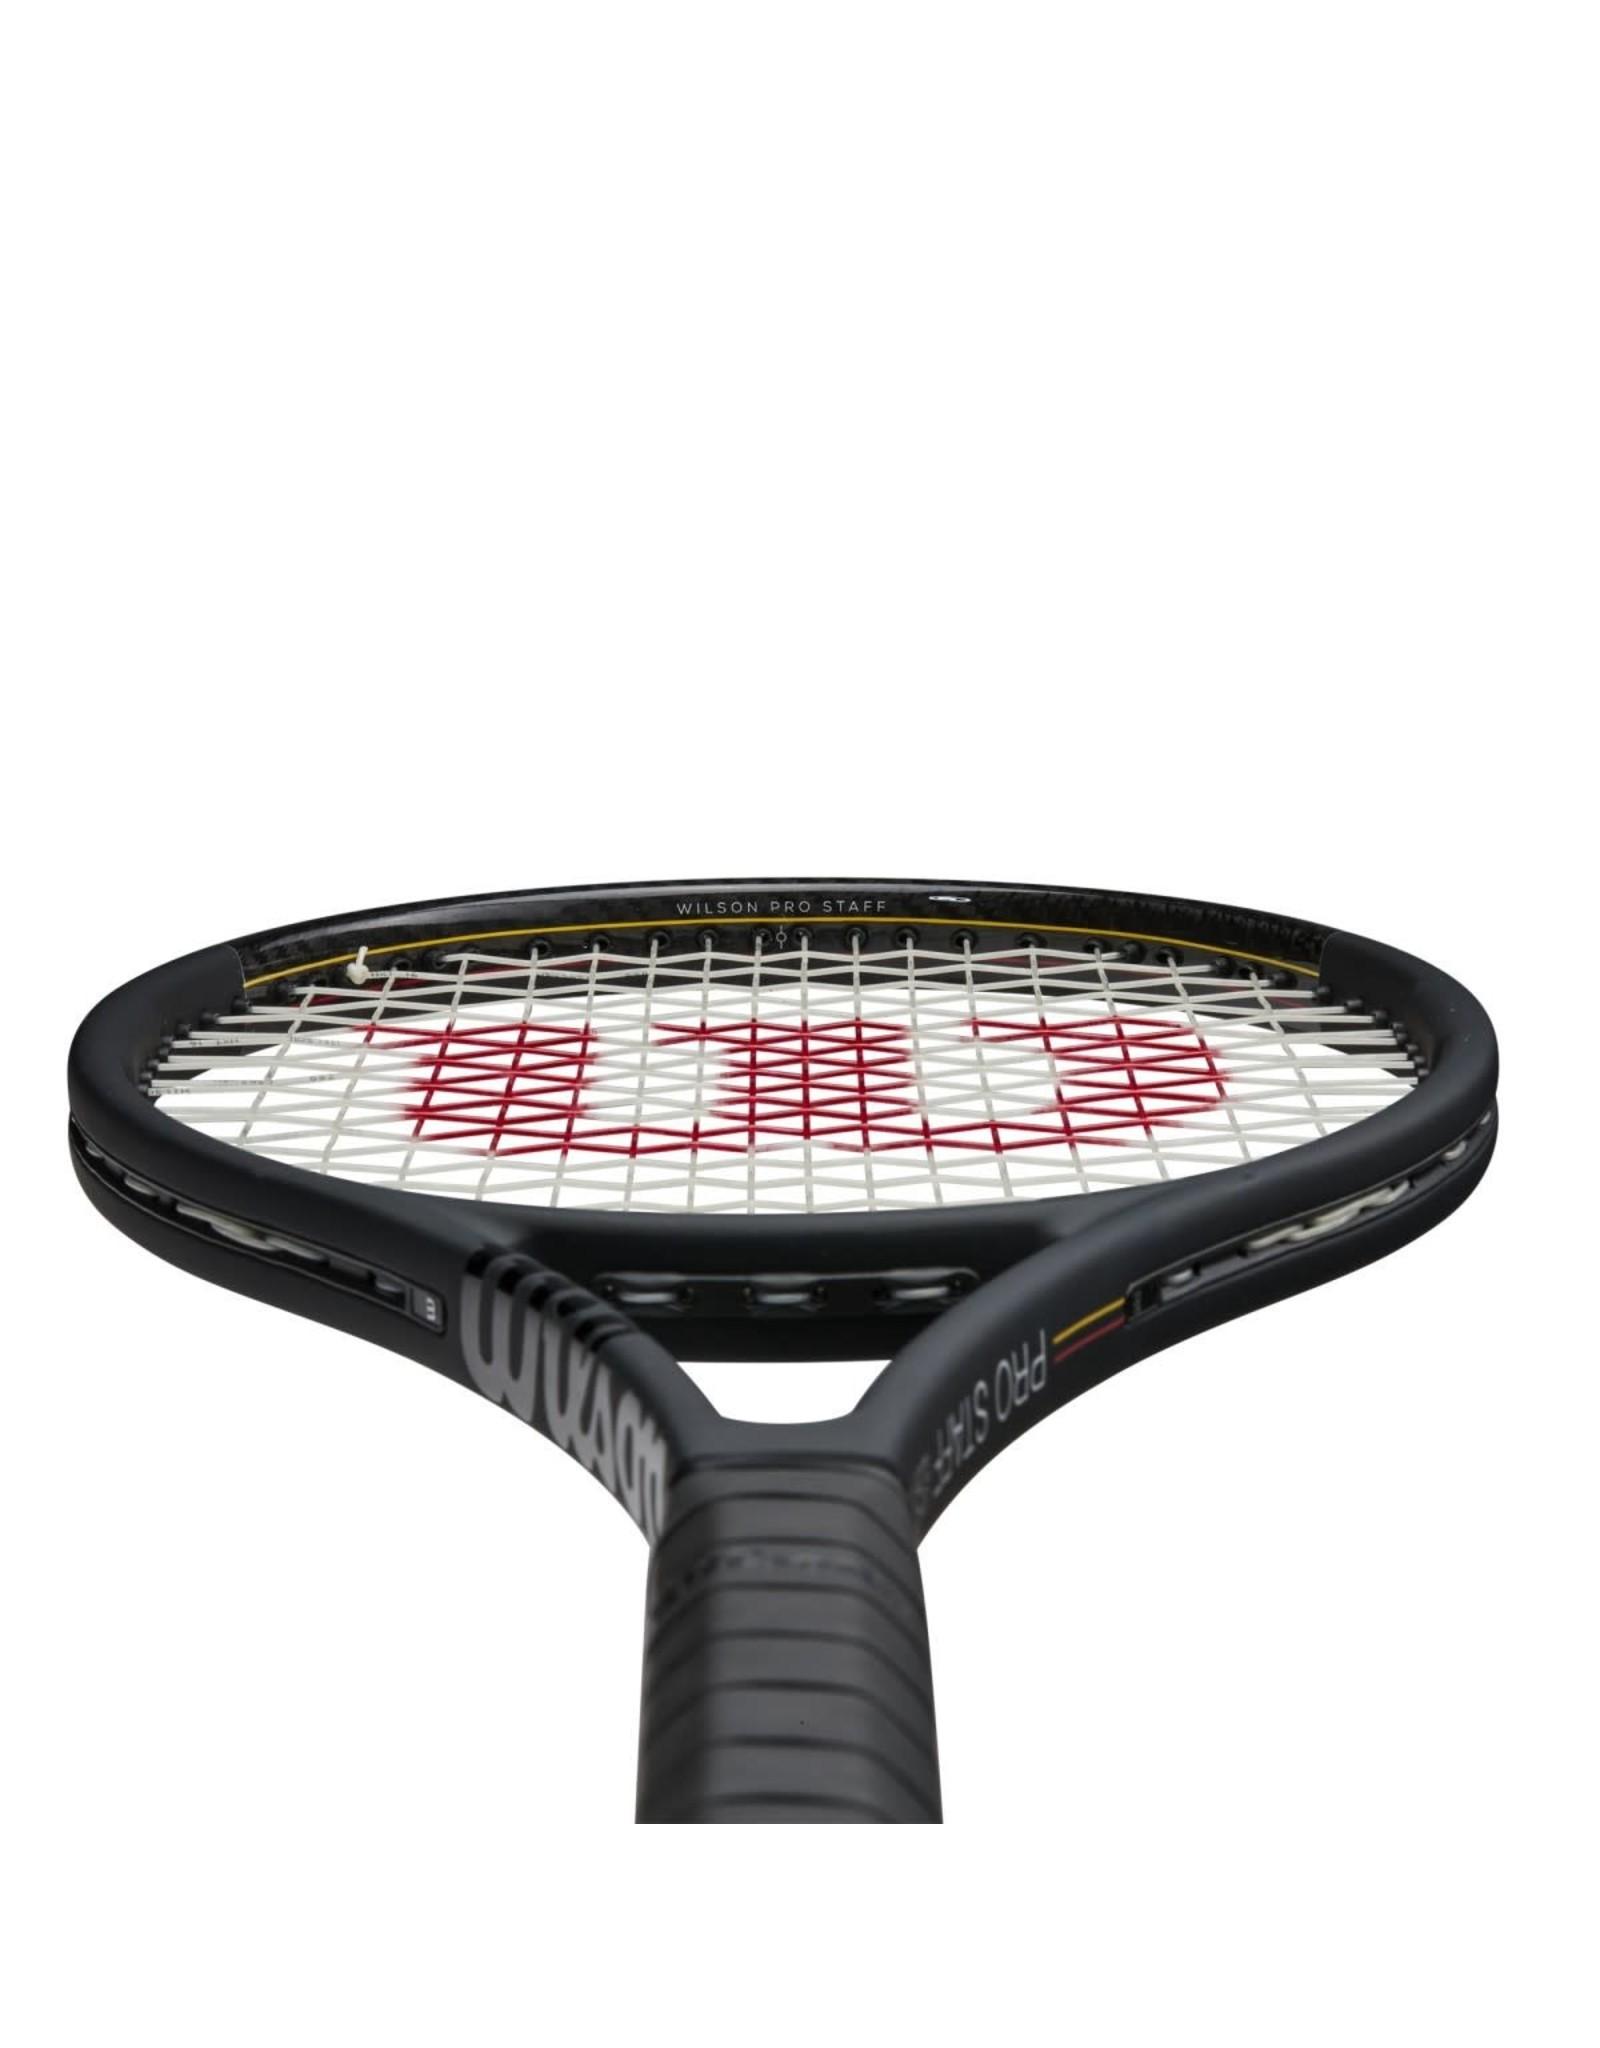 Wilson Wilson Pro Staff 97L v13 Tennis Racket